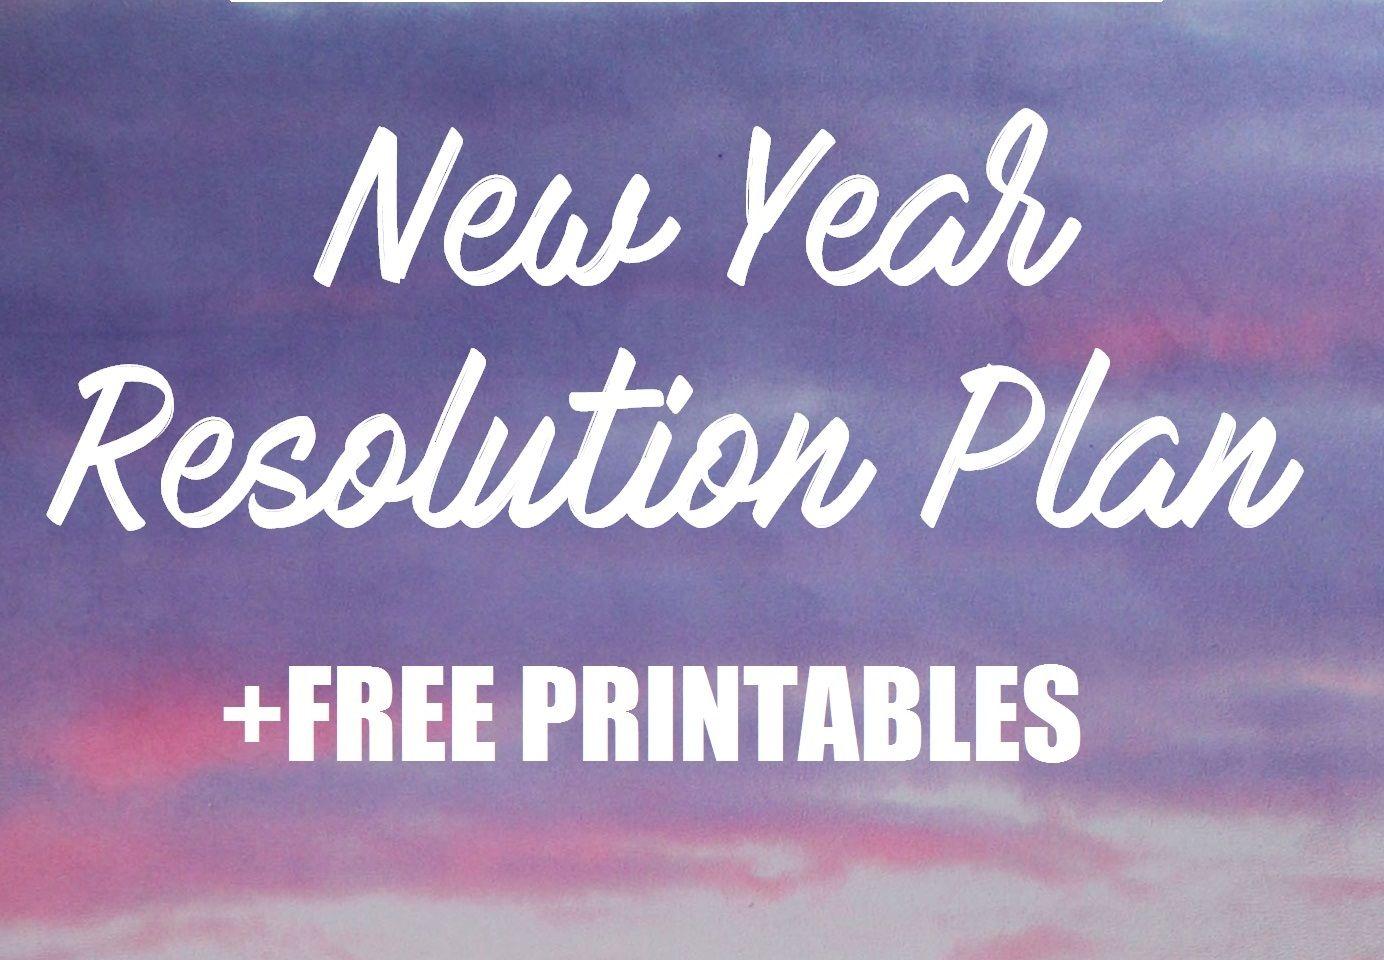 New Year Resolution Fitness Plan